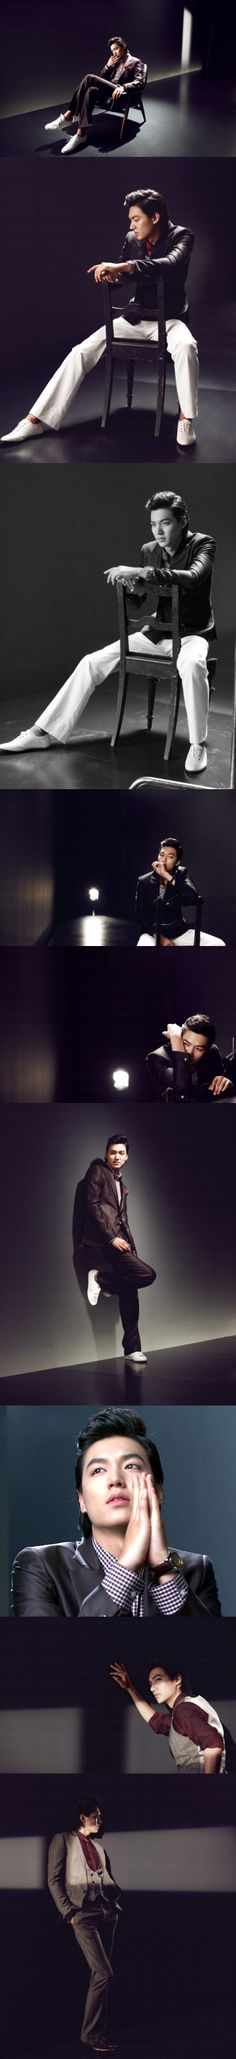 nang mui o dau dep Boys Over Flowers, Lee Min Ho Kdrama, Lee Min Ho Photos, Sexy Asian Men, Korean Face, Kim Sang, City Hunter, Kim Woo Bin, Snow White